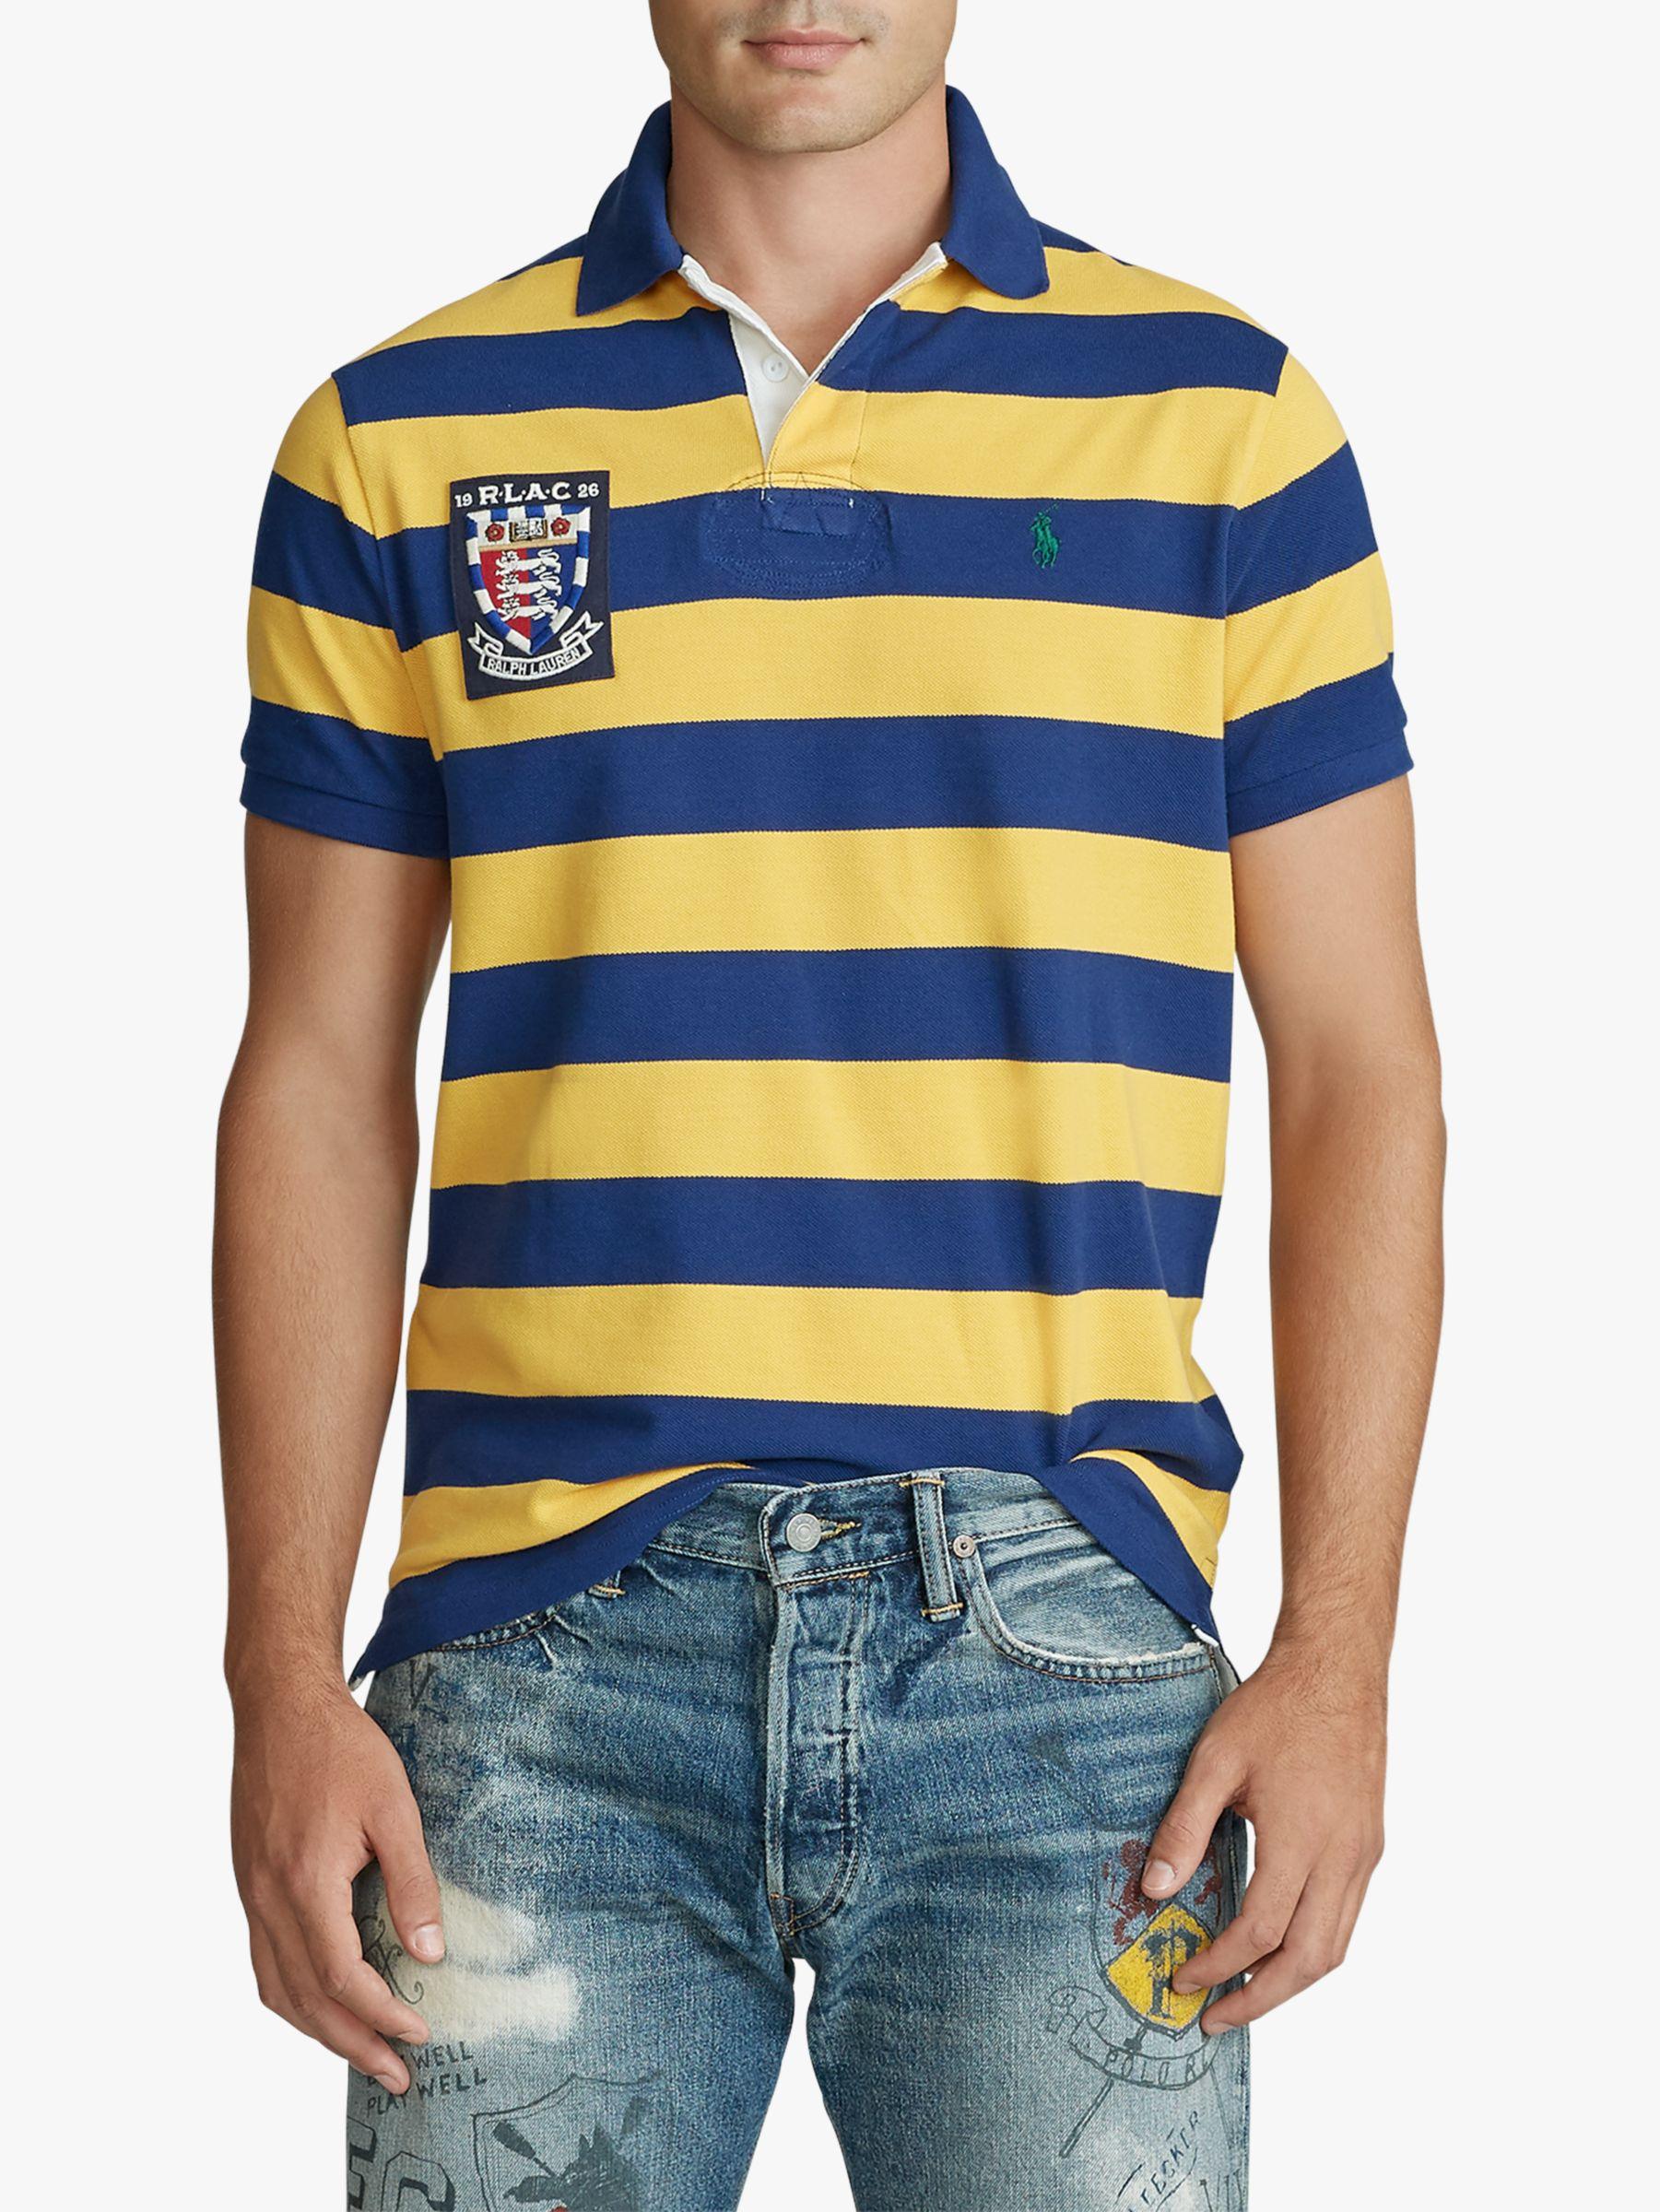 d800a7a68 Polo Ralph Lauren Custom Slim Fit Mesh Polo Shirt, Sapphire/Gold